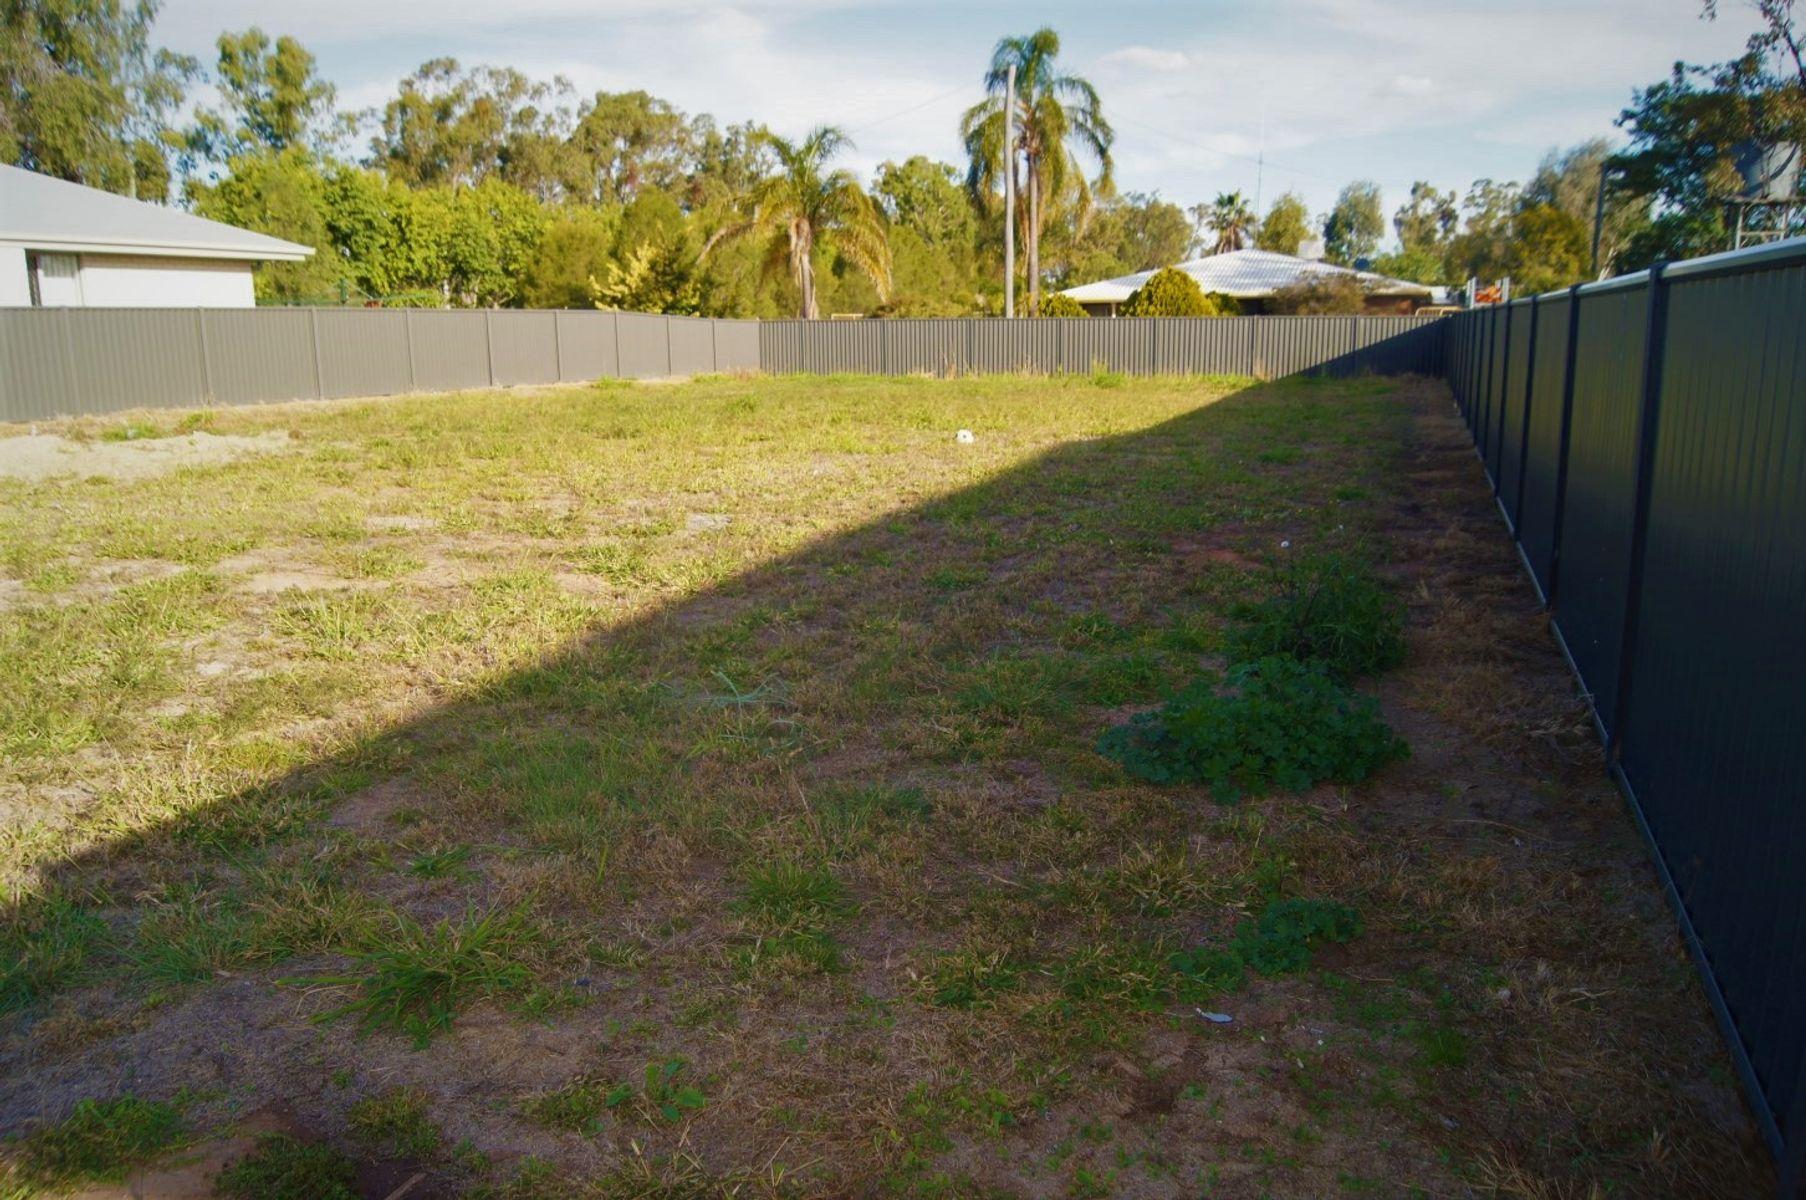 Lot 65 Frame Street, Chinchilla, QLD 4413